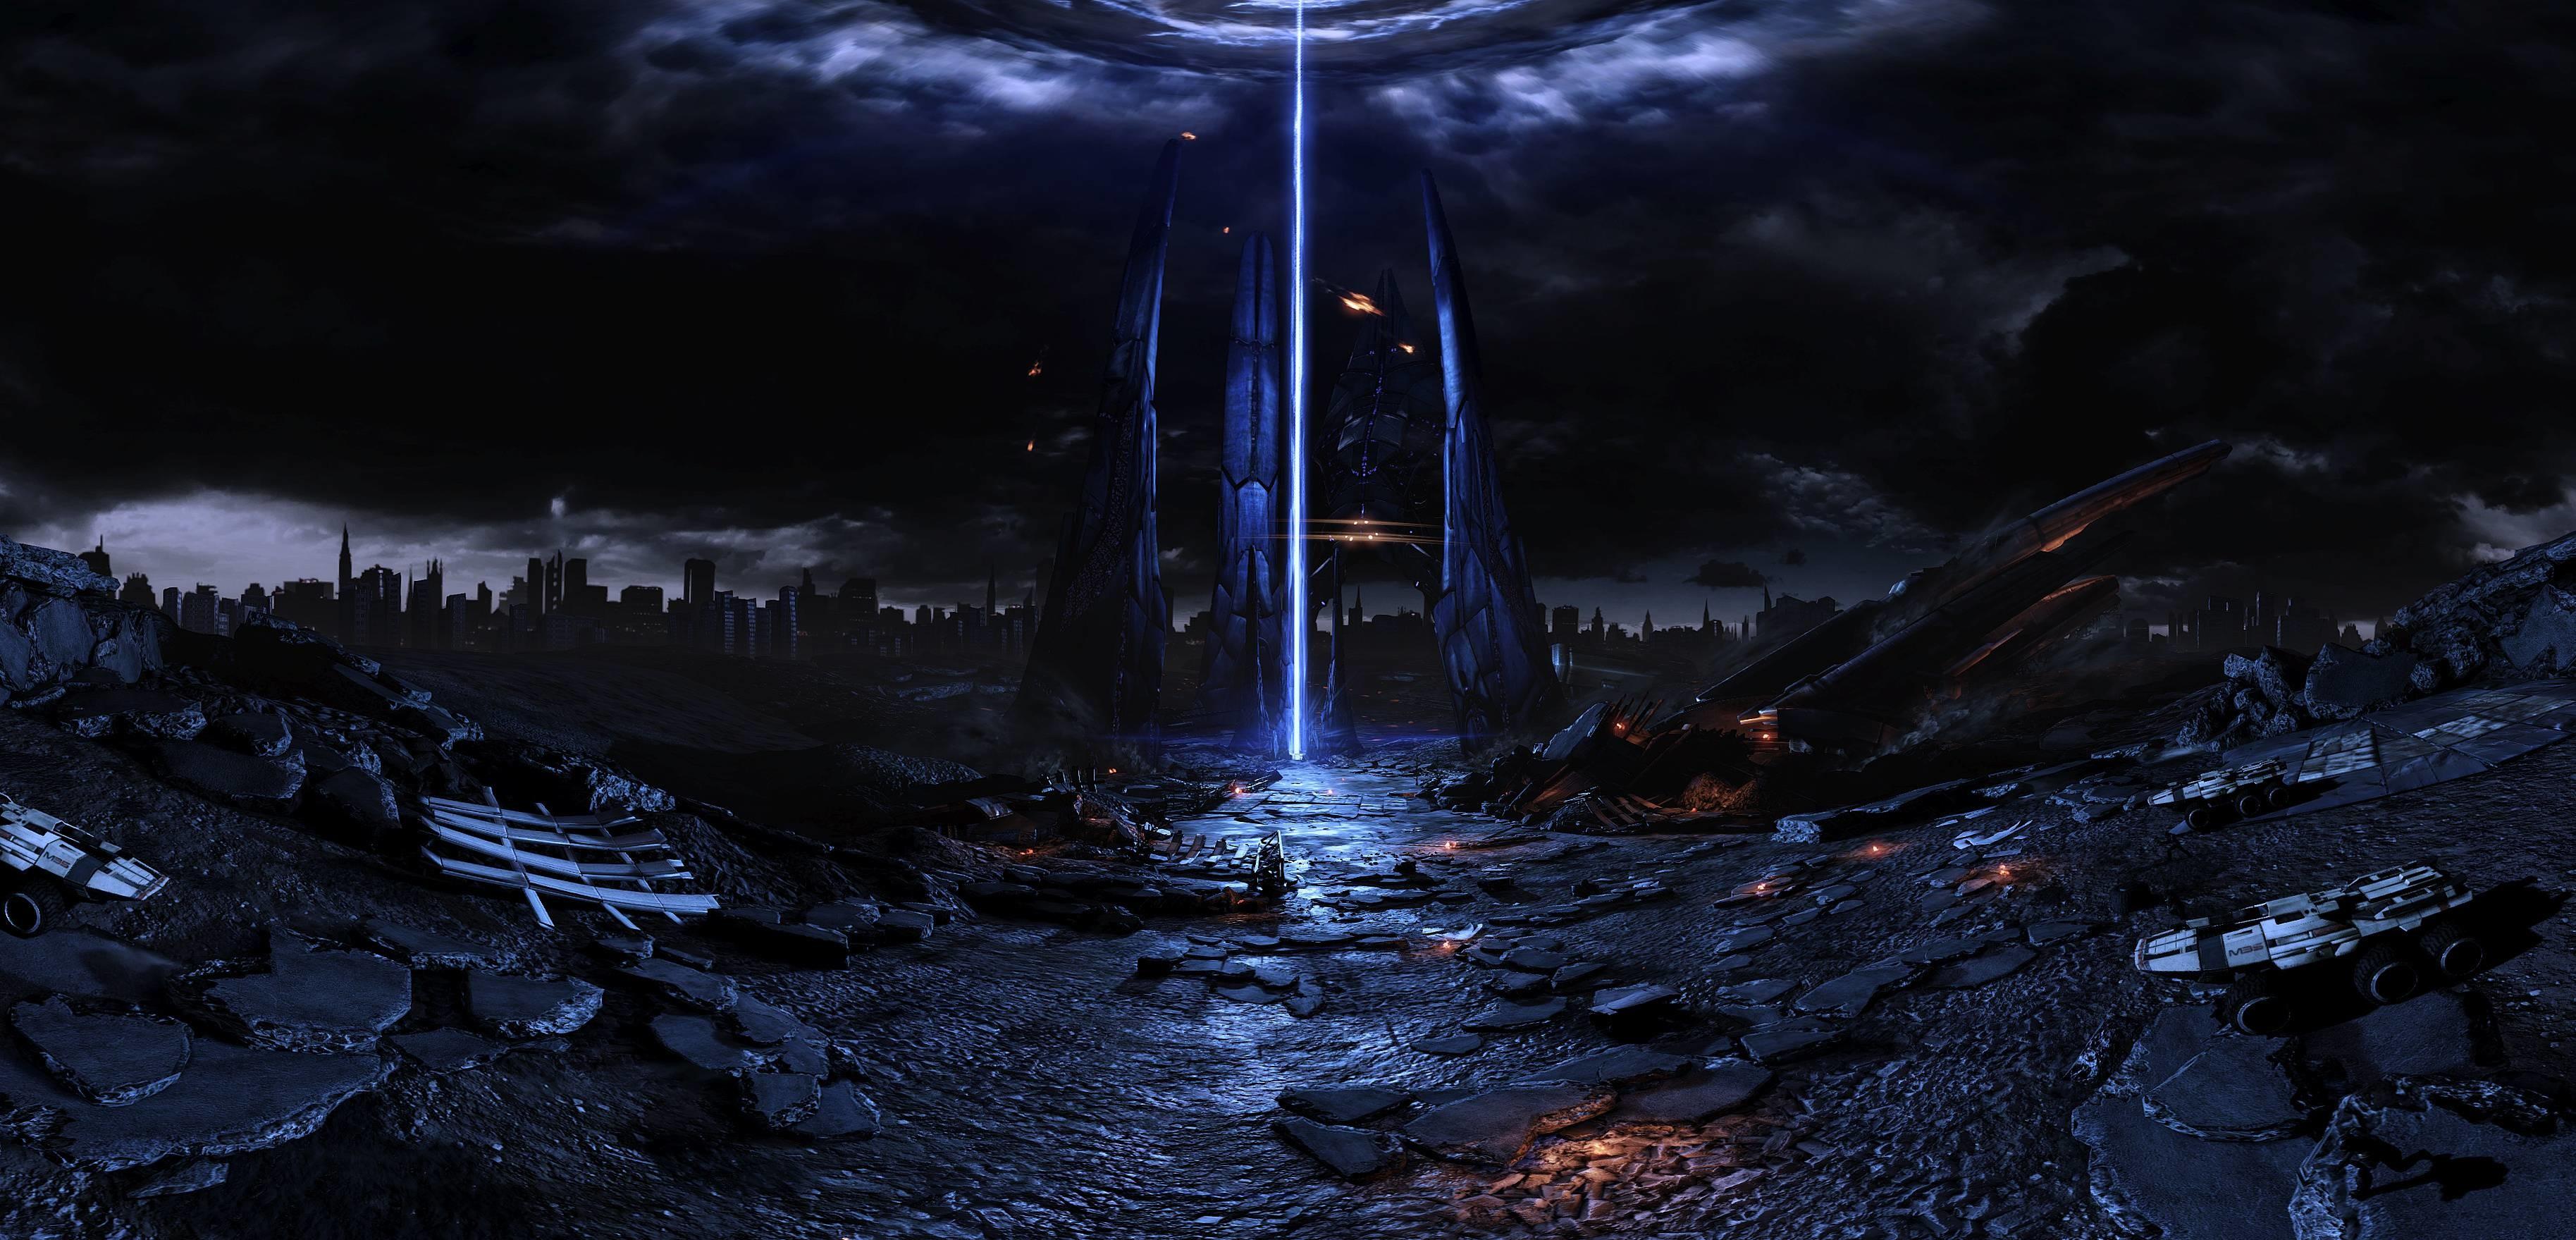 Mass effect fan reaper harbinger art pano spaceship sci-fi .